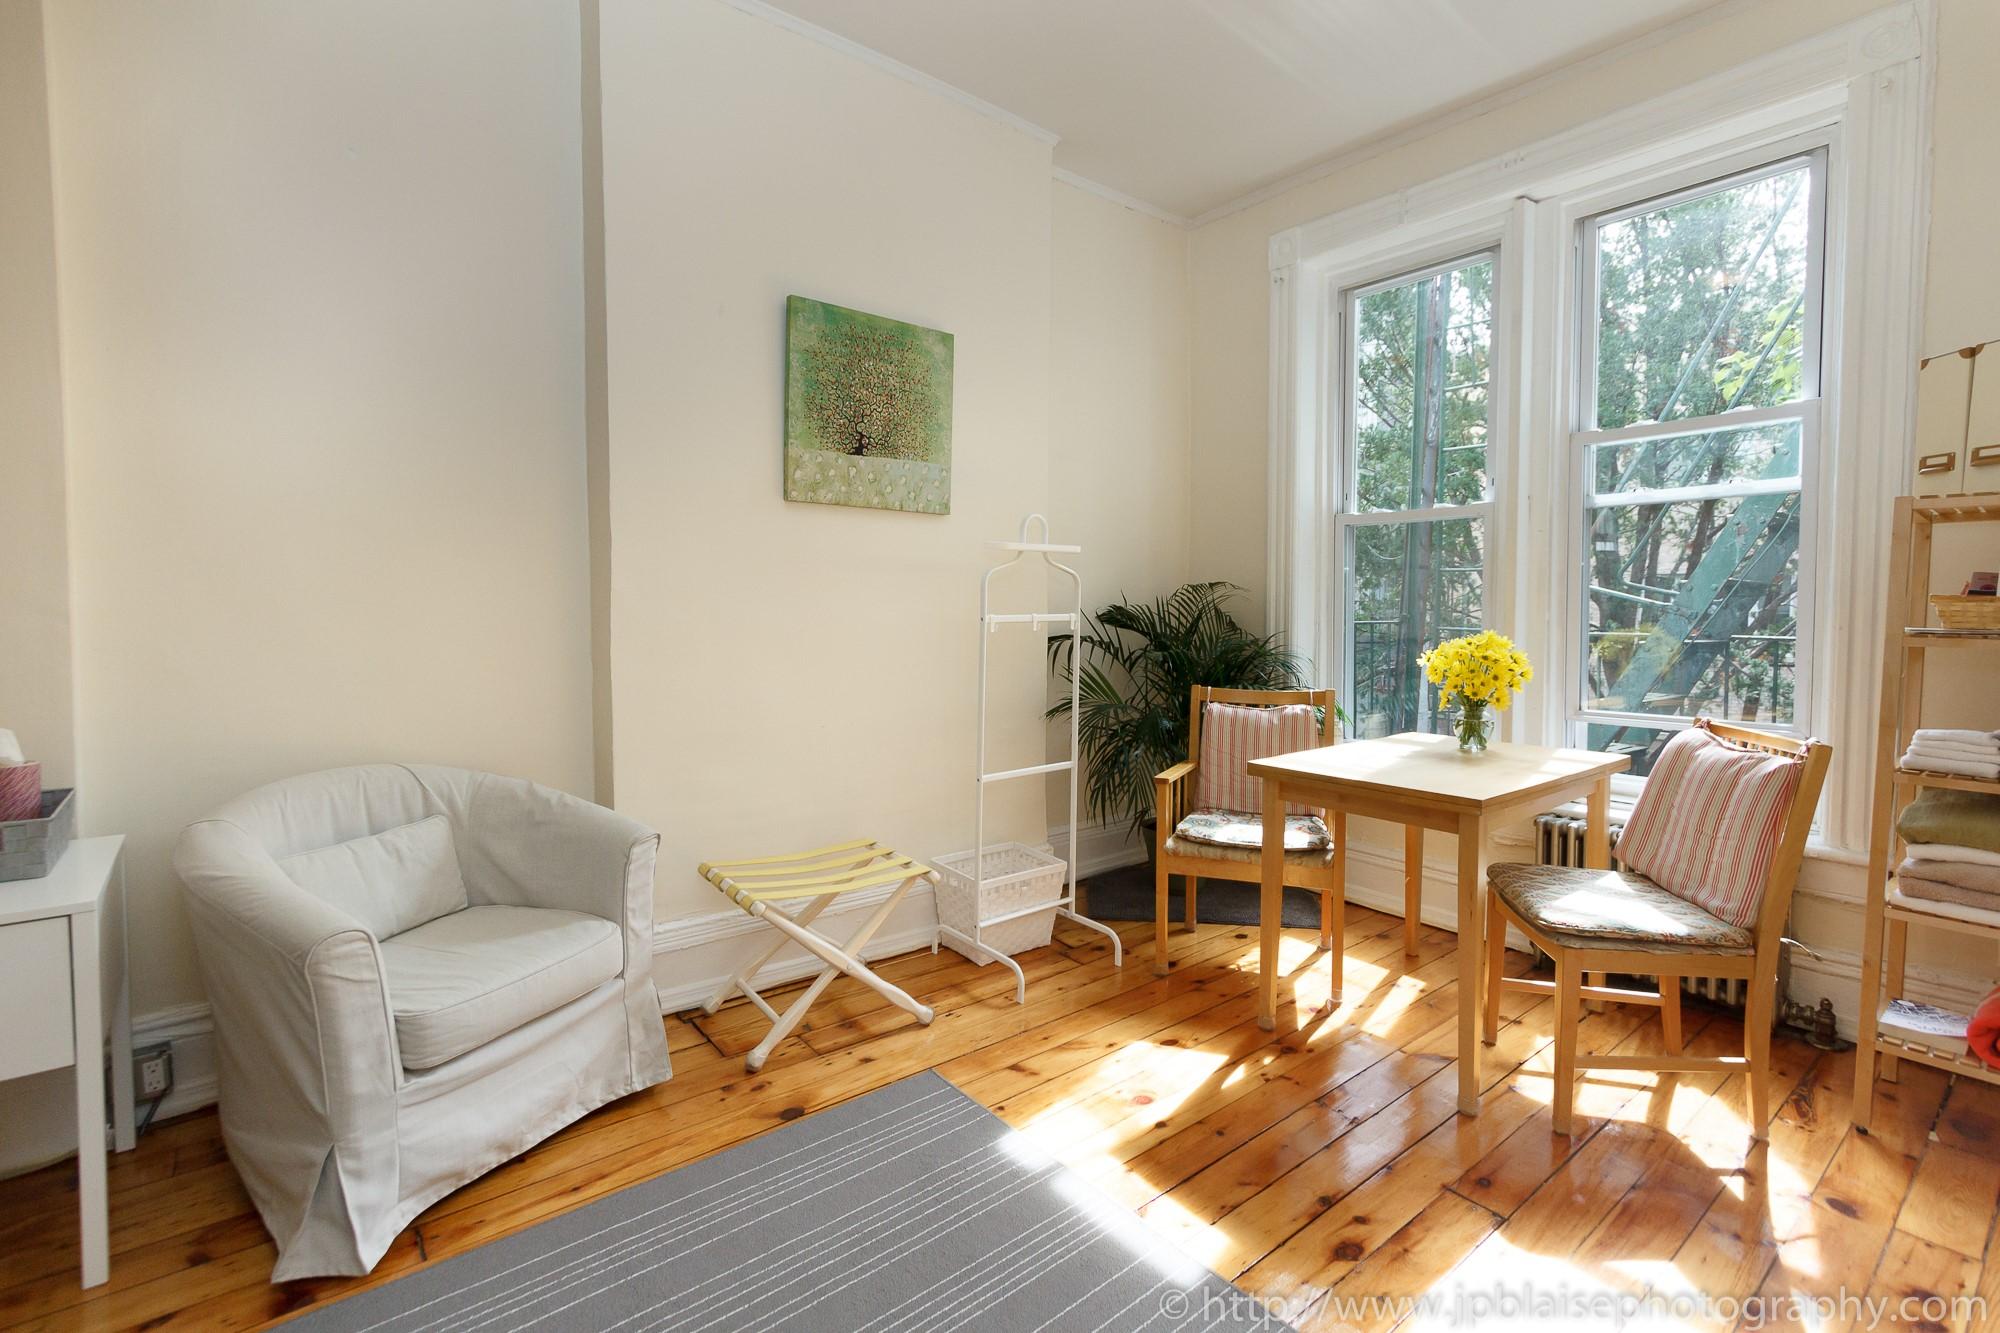 Apartment photographer adventures in New York: One bedroom ...